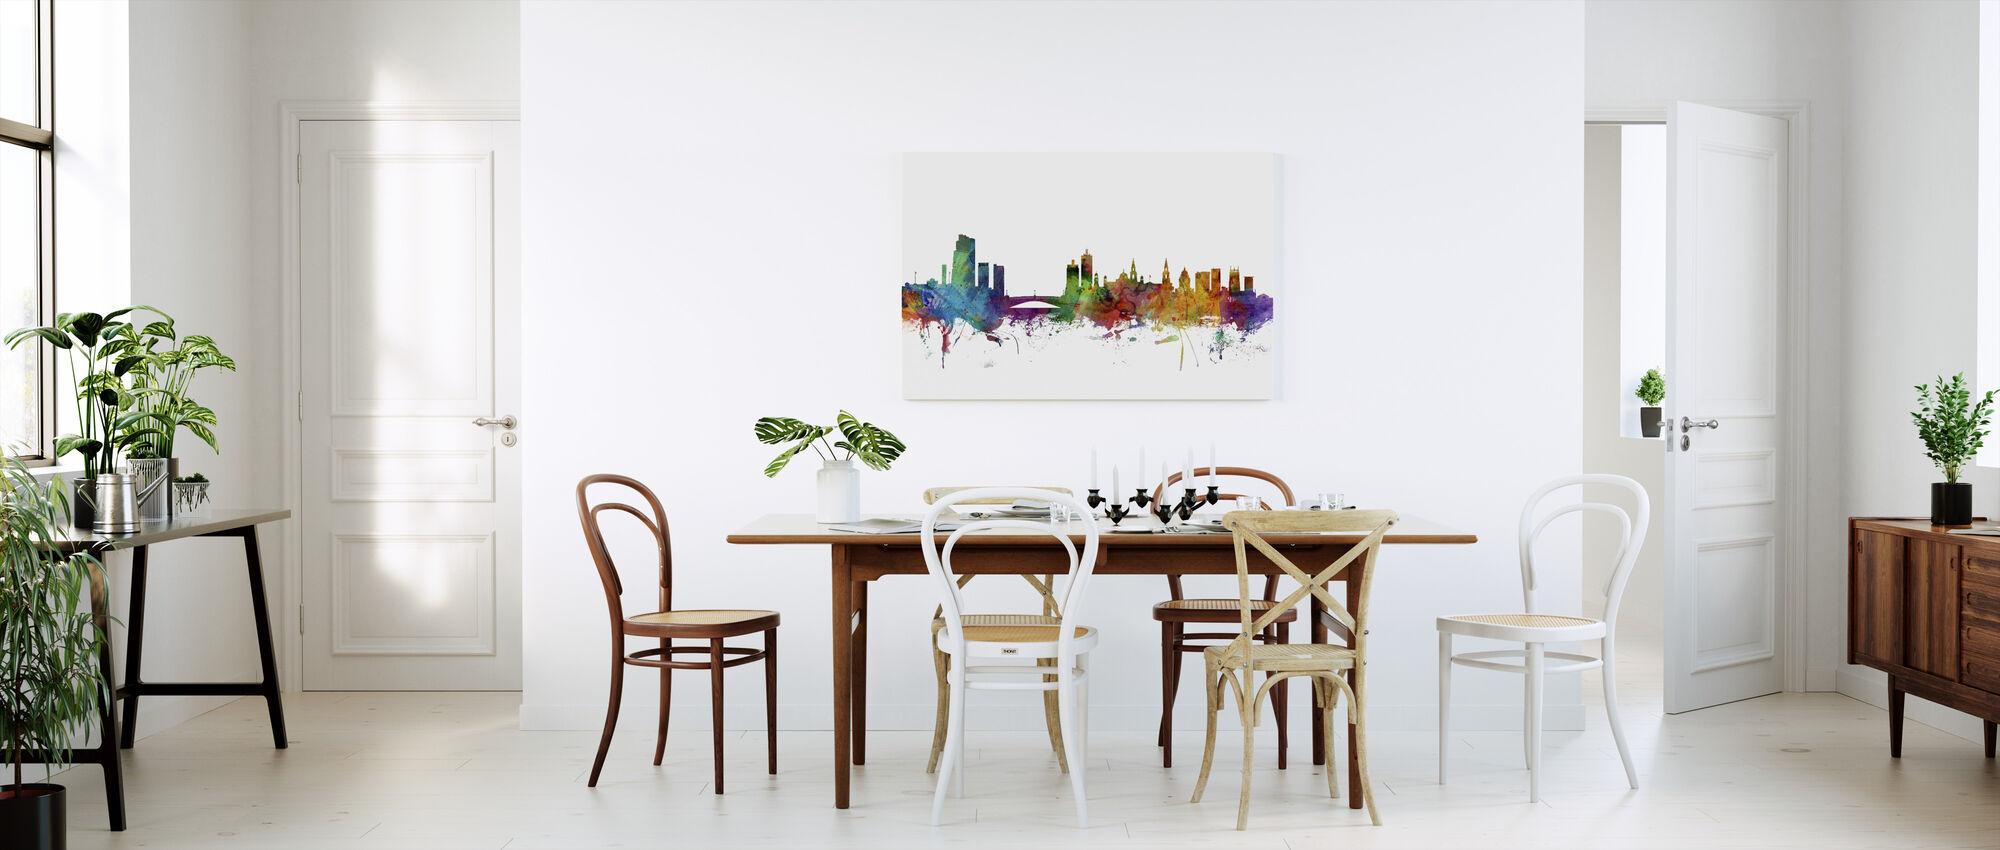 Leeds England Skyline - Canvas print - Kitchen